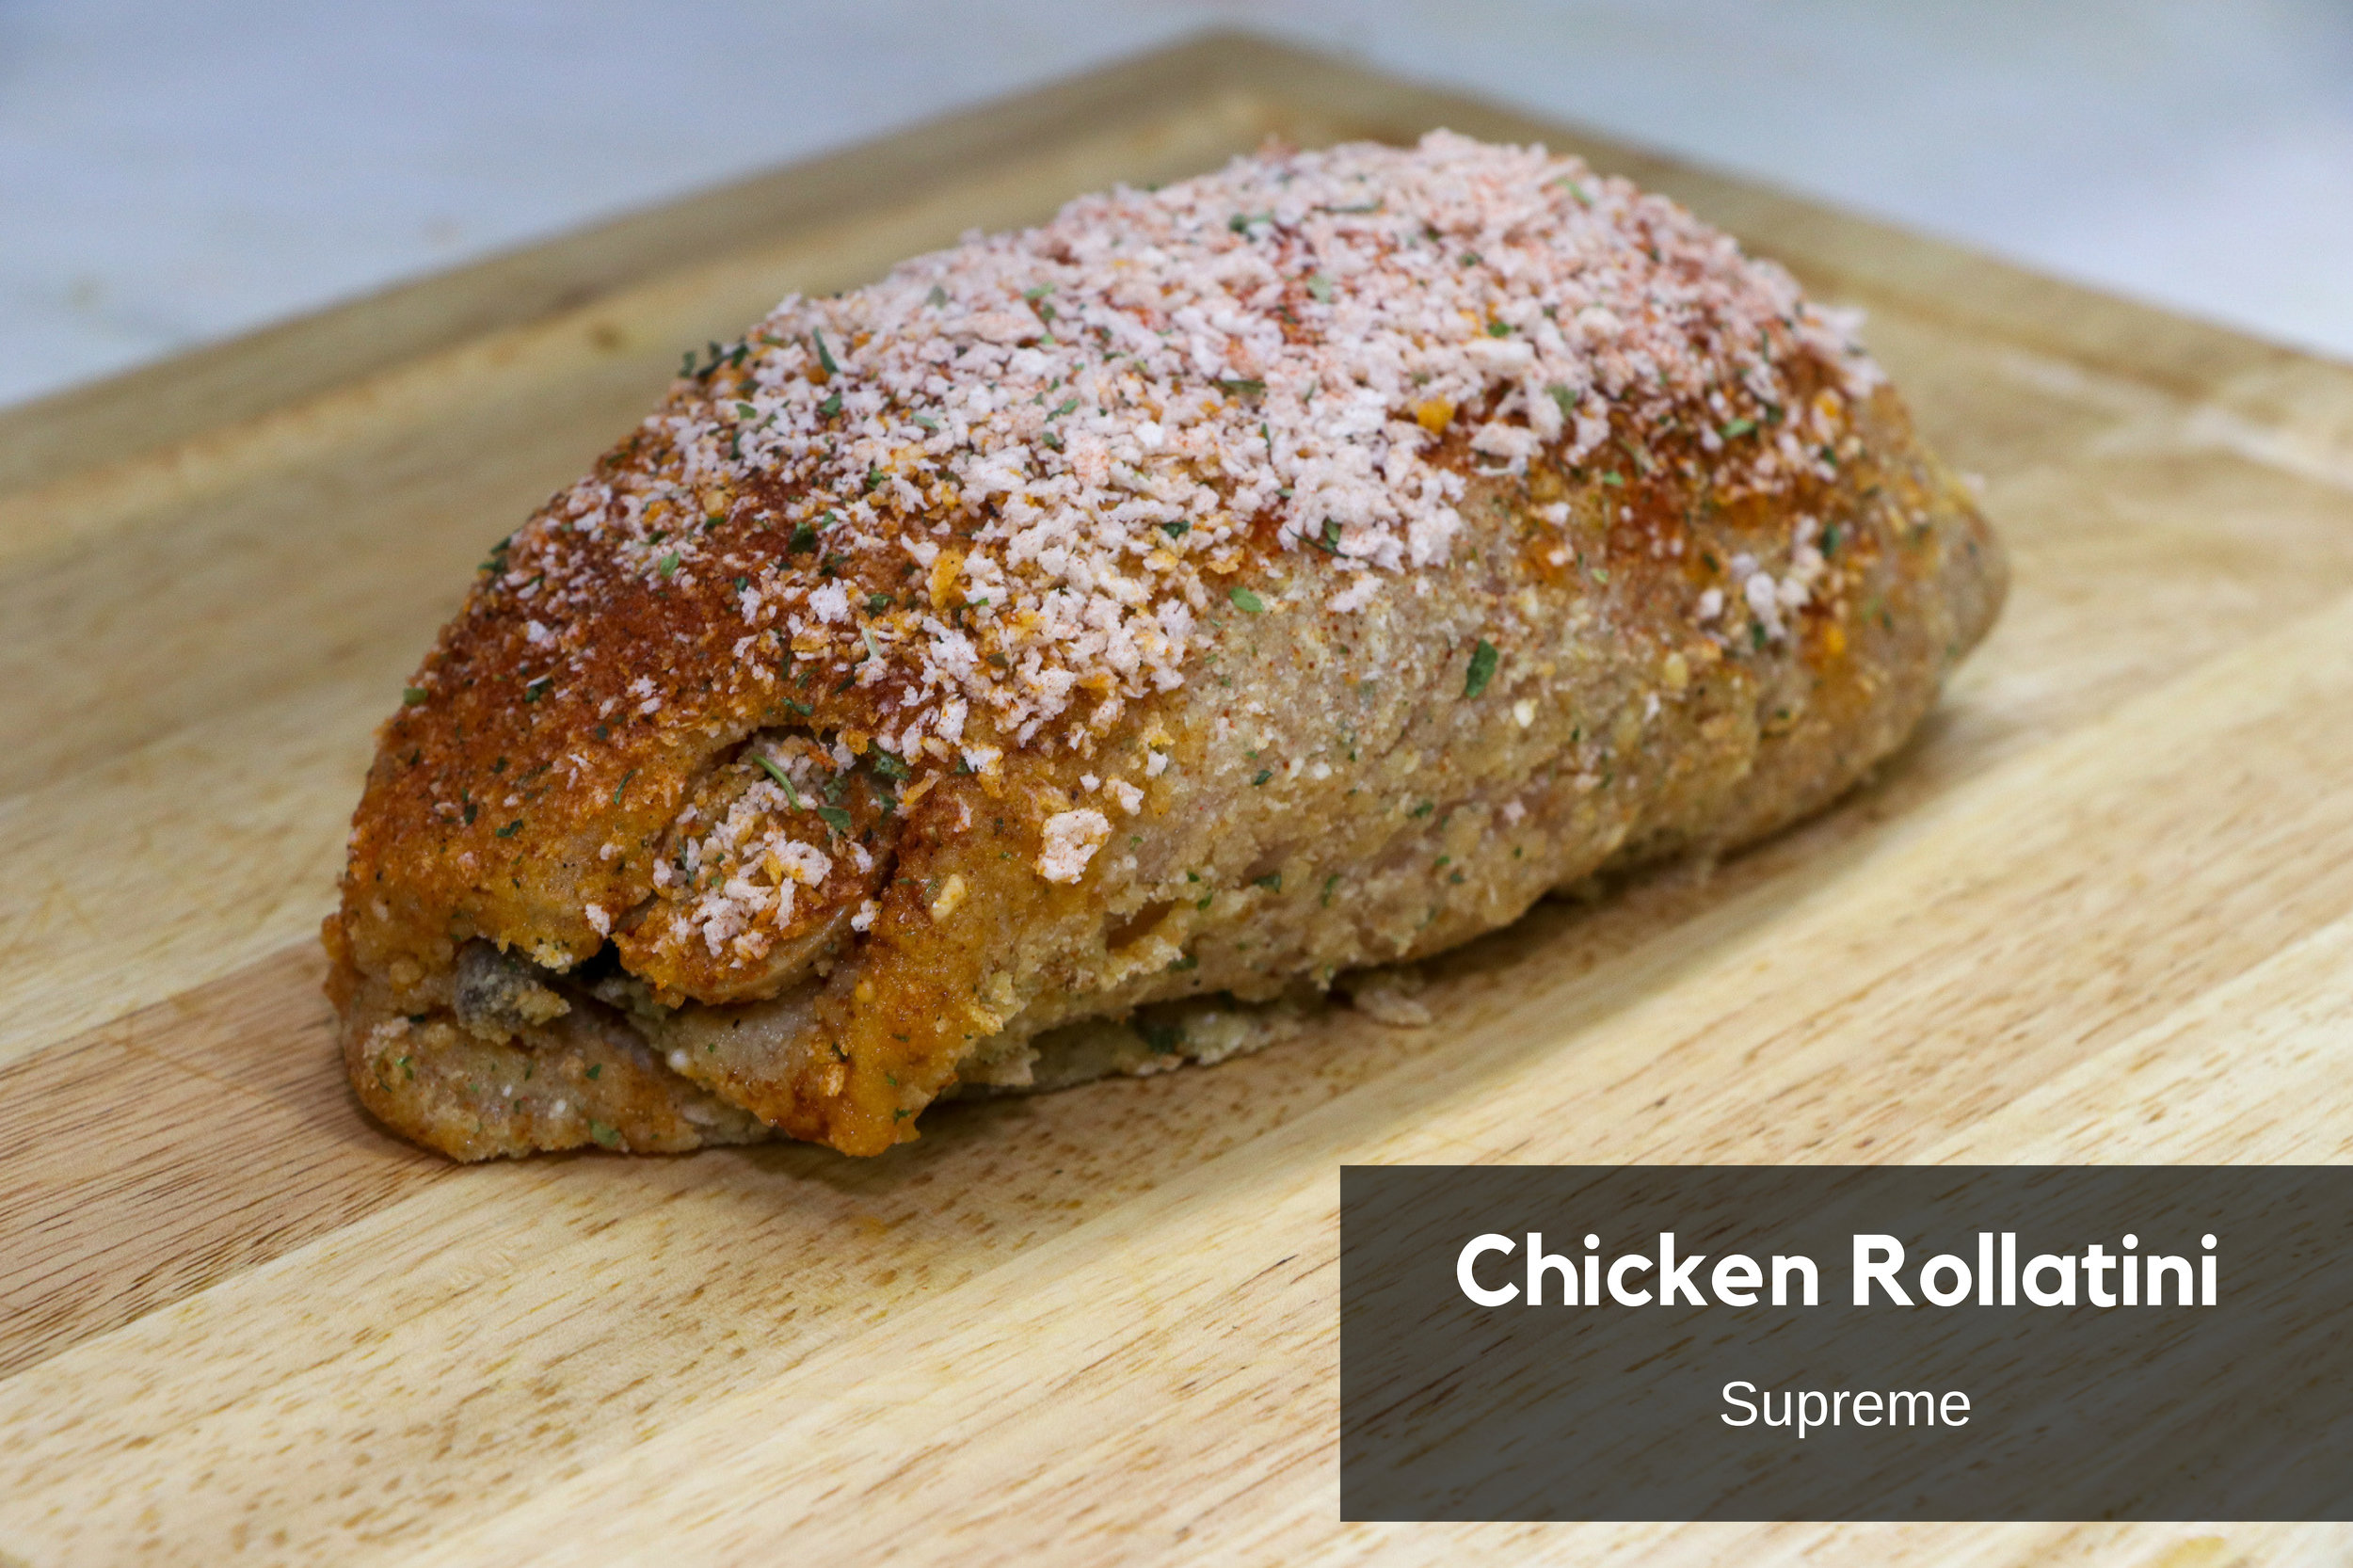 chicken+rollatini+supreme.jpg